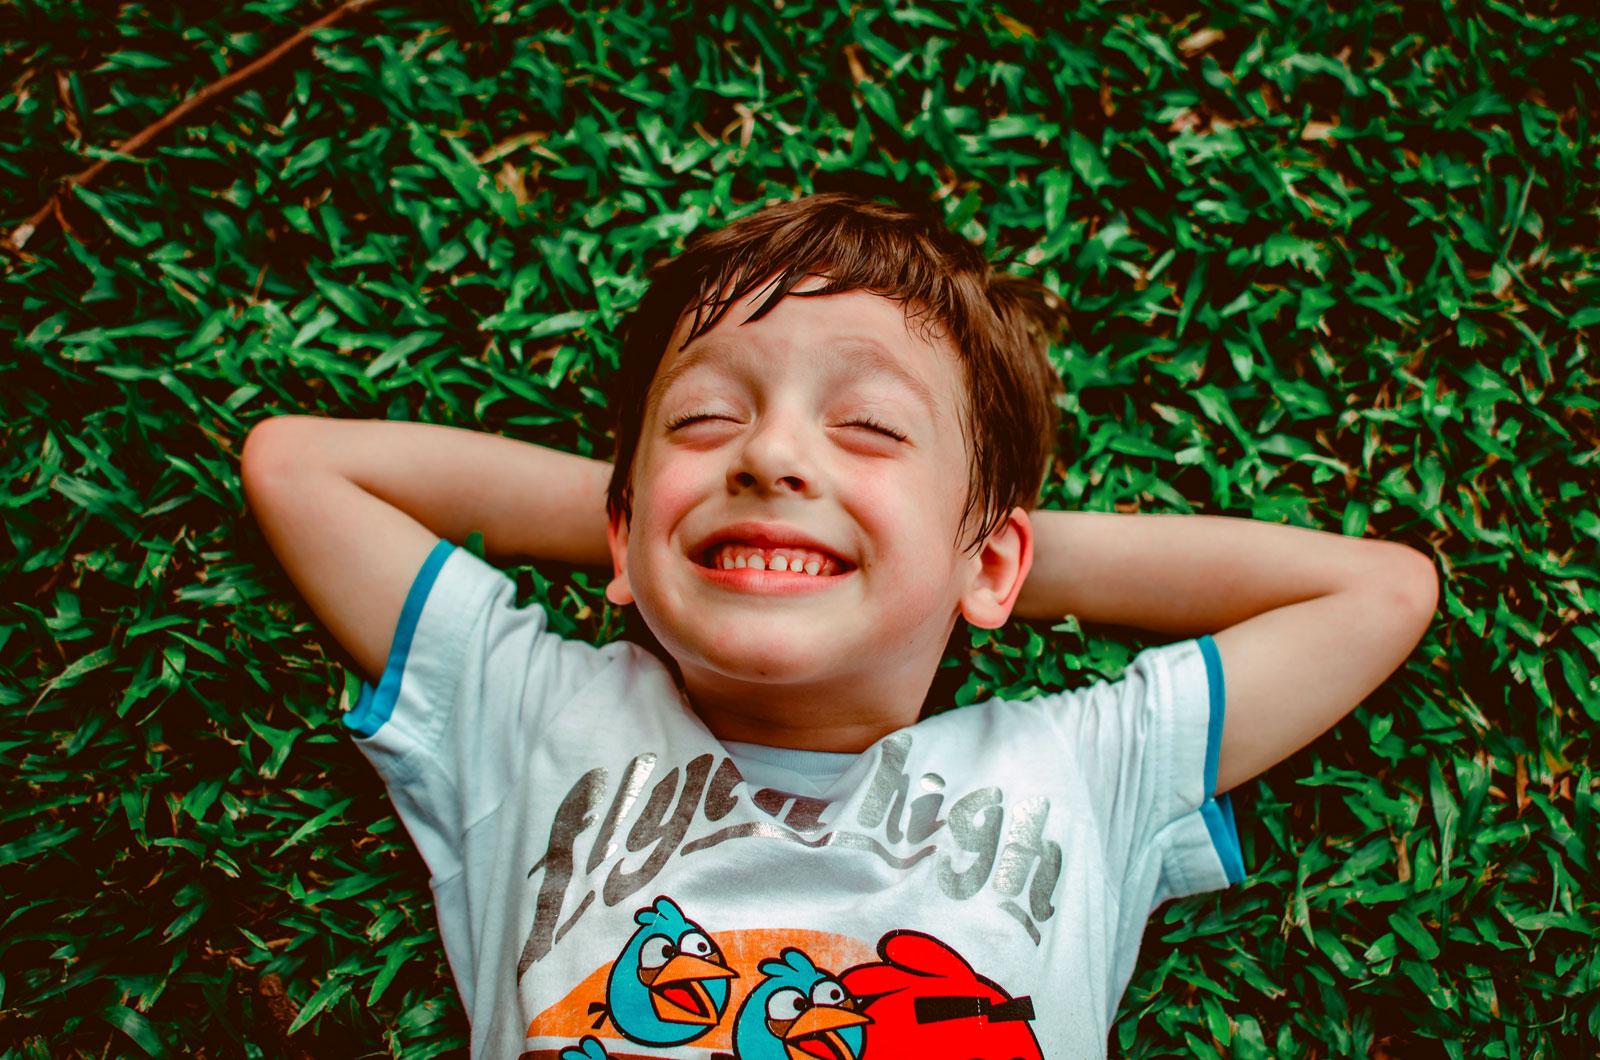 adorable-boy-child-2347975.jpg